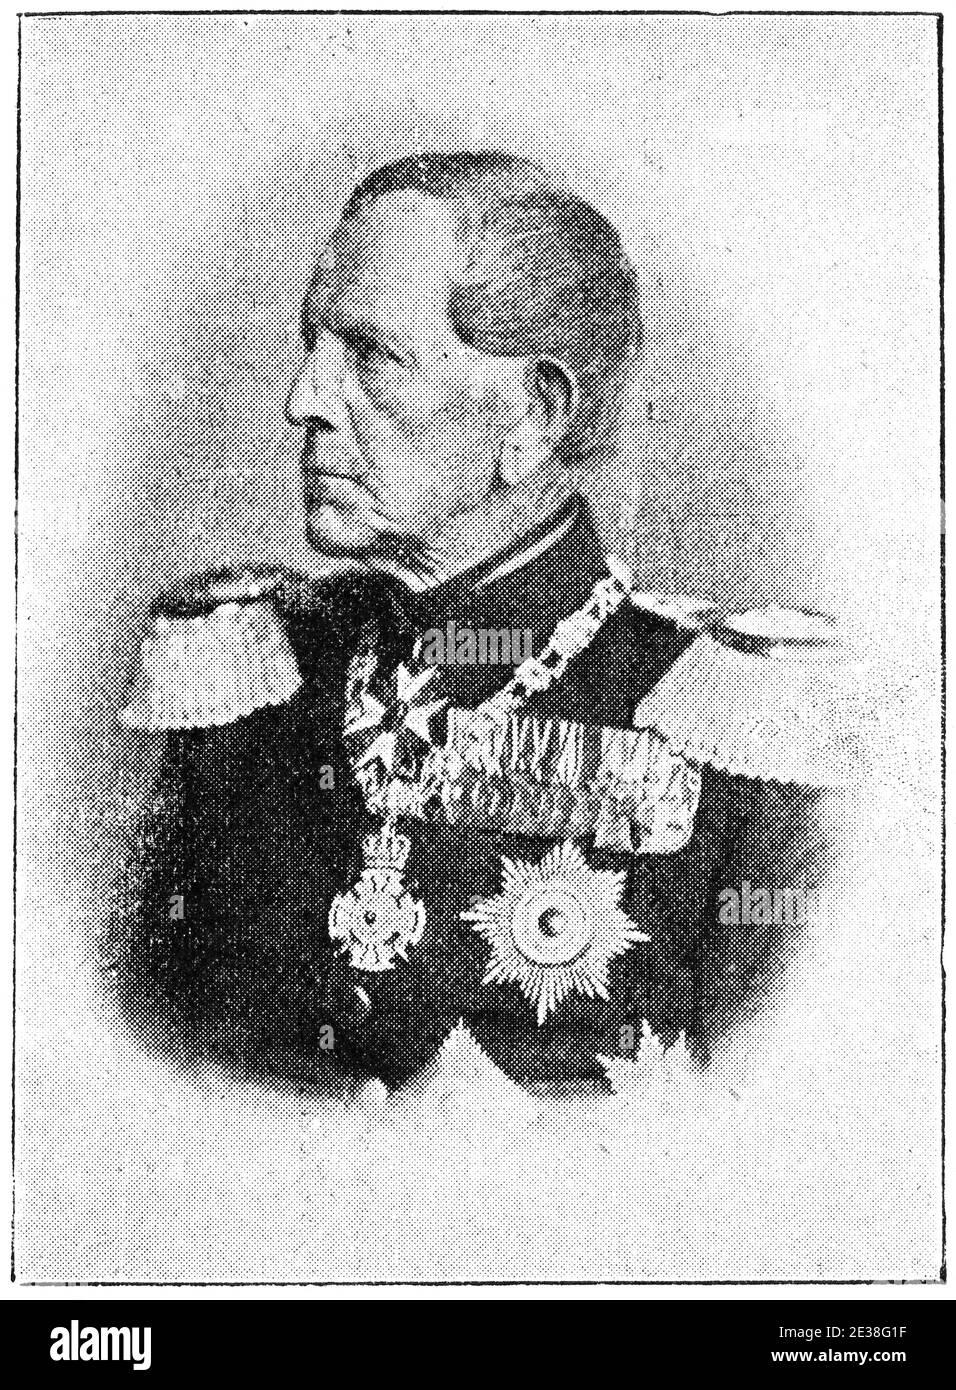 Portrait of Graf Helmuth Karl Bernhard von Moltke - a Prussian field marshal. Illustration of the 19th century. Germany. White background. Stock Photo